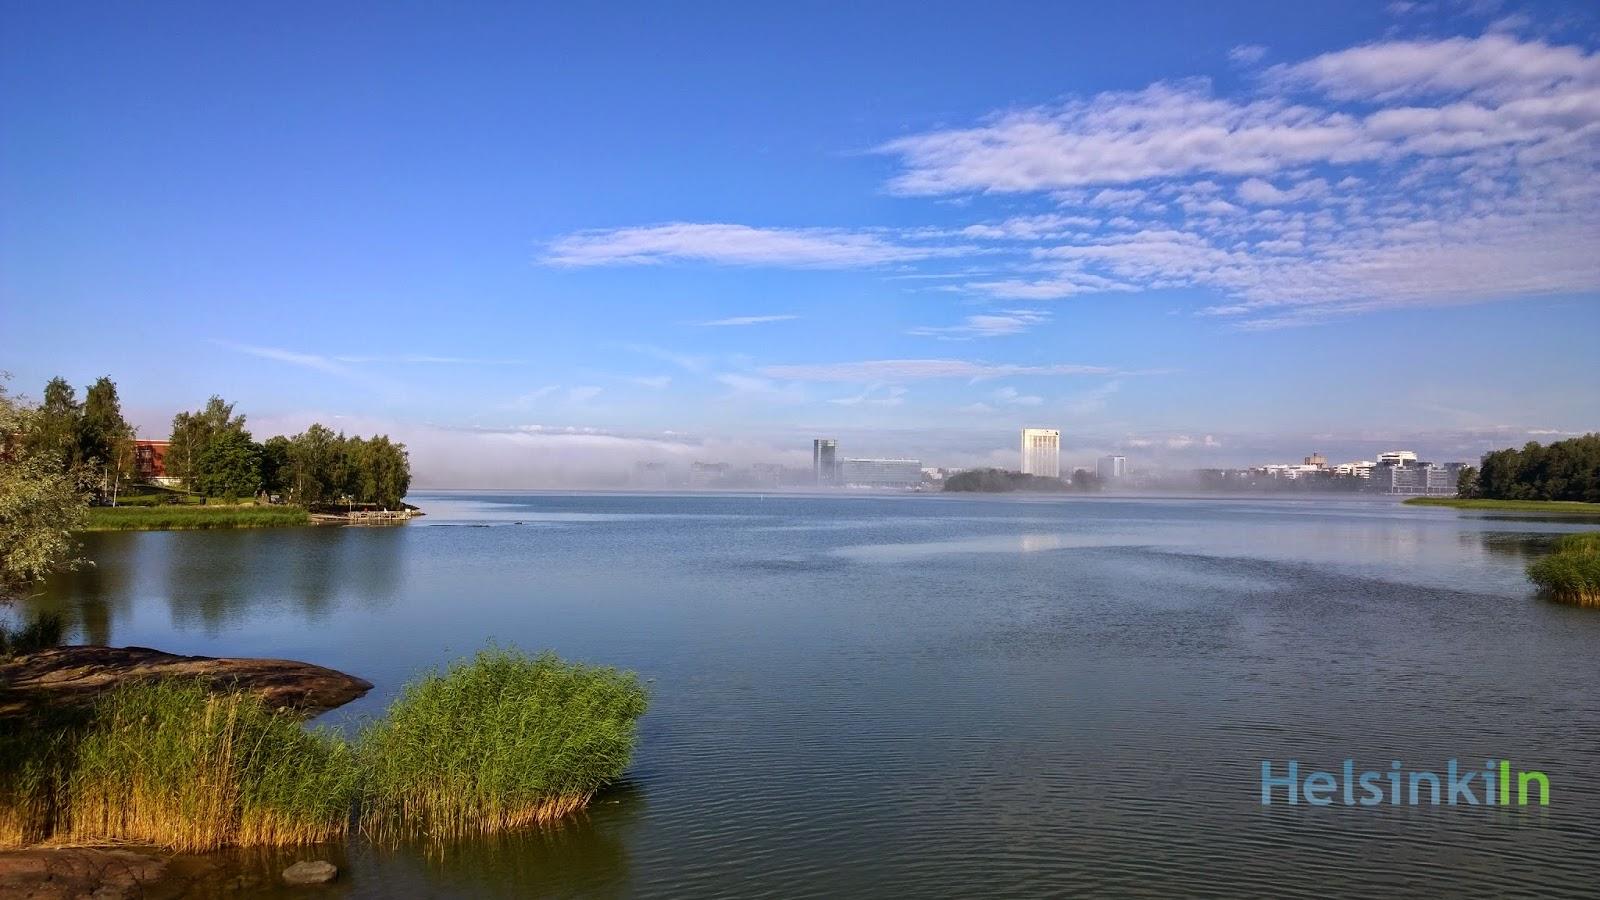 fog over Keilaniemi